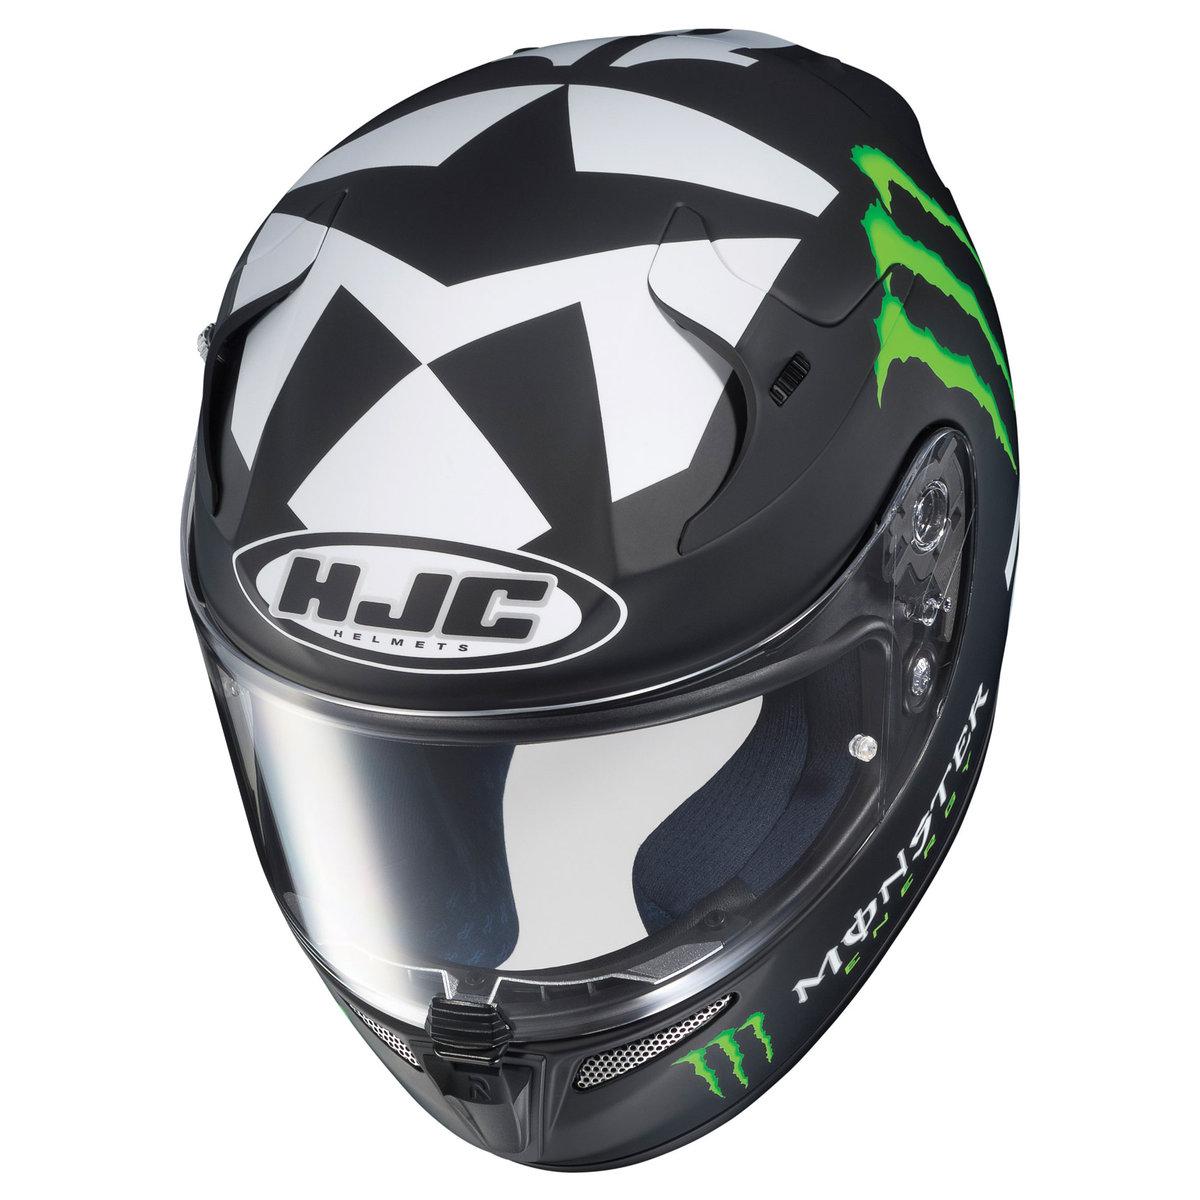 hjc rpha 10 ben spies ii 2 monster energy replica helmet full face matte black ebay. Black Bedroom Furniture Sets. Home Design Ideas